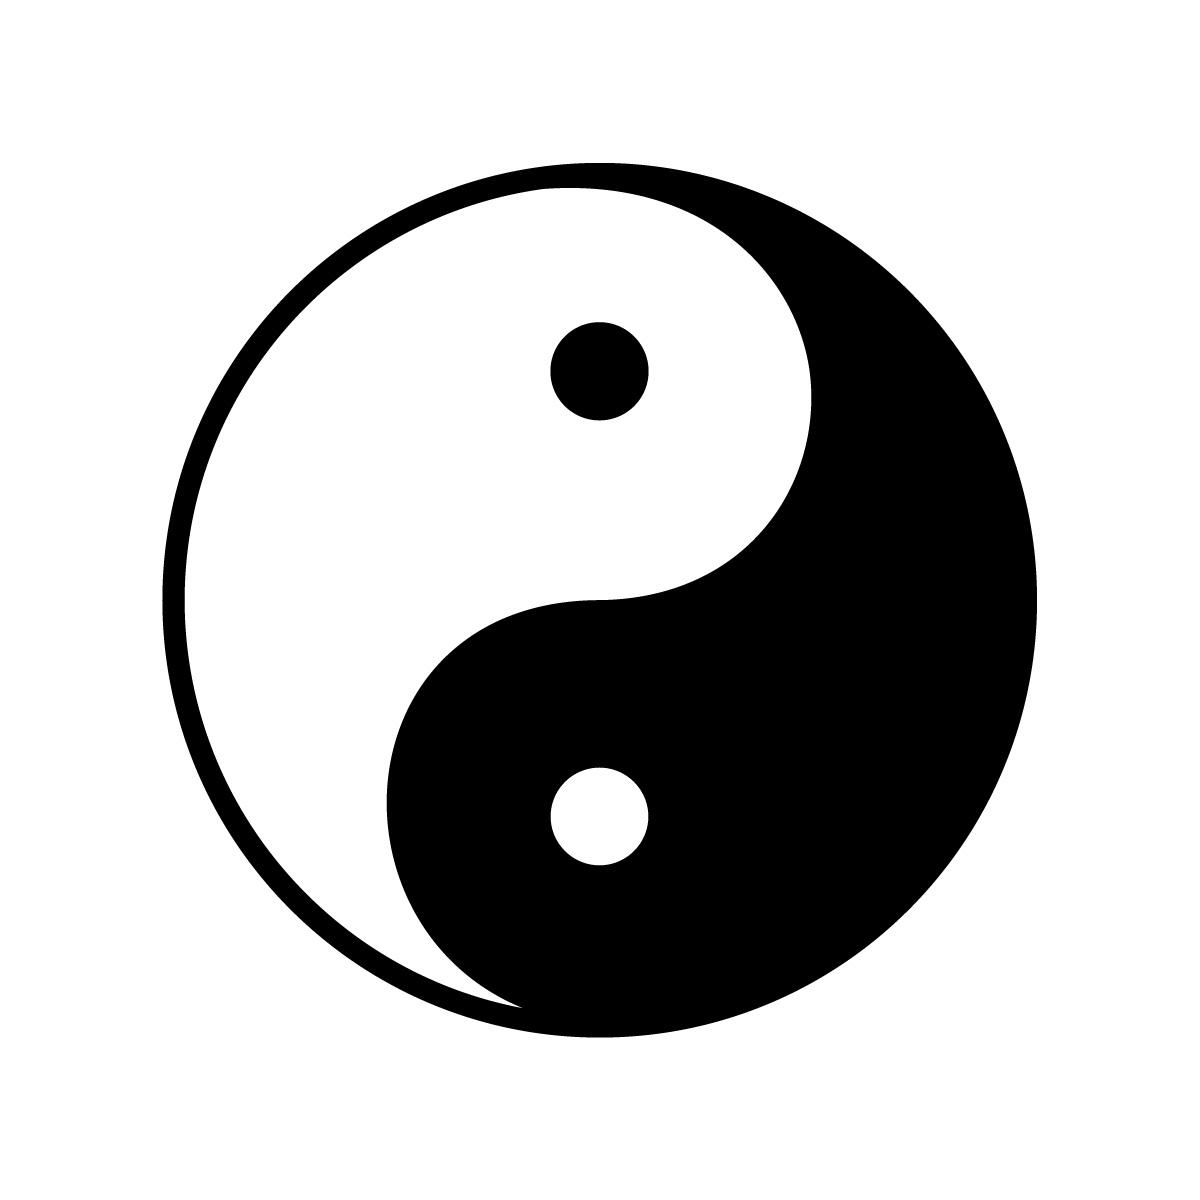 Jordan Peterson explains the yin yang symbol | Logo Design Love